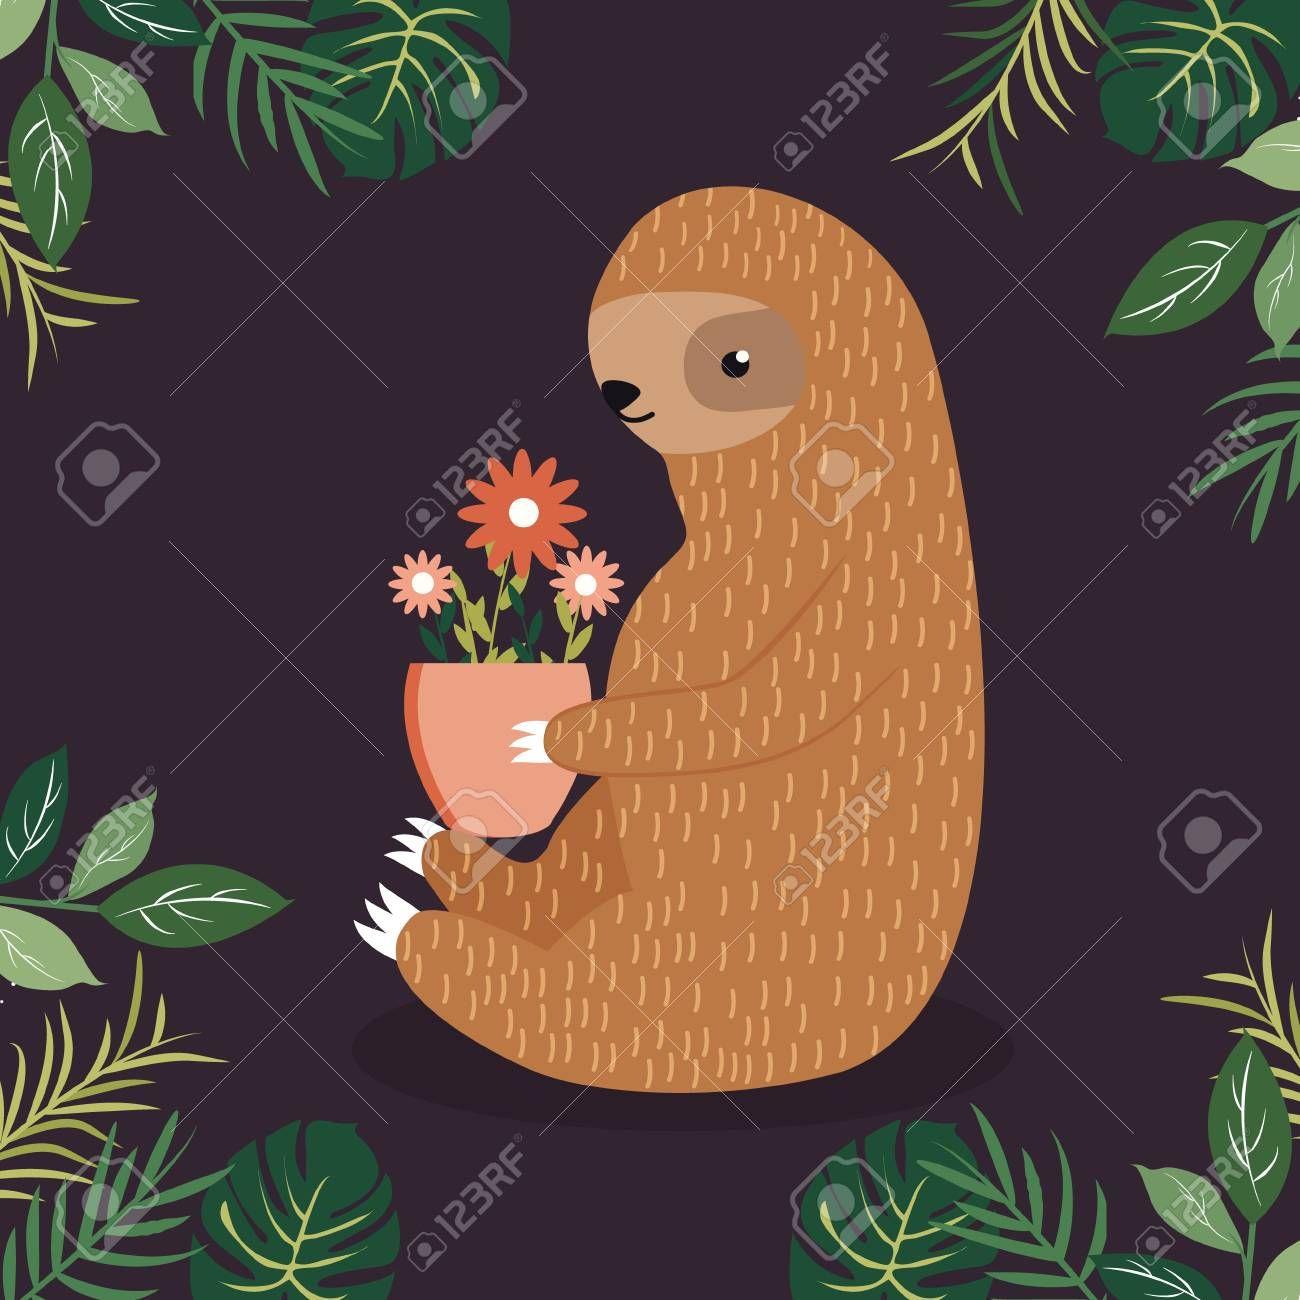 Stock Vector Cute sloth, Sloth, Vector art